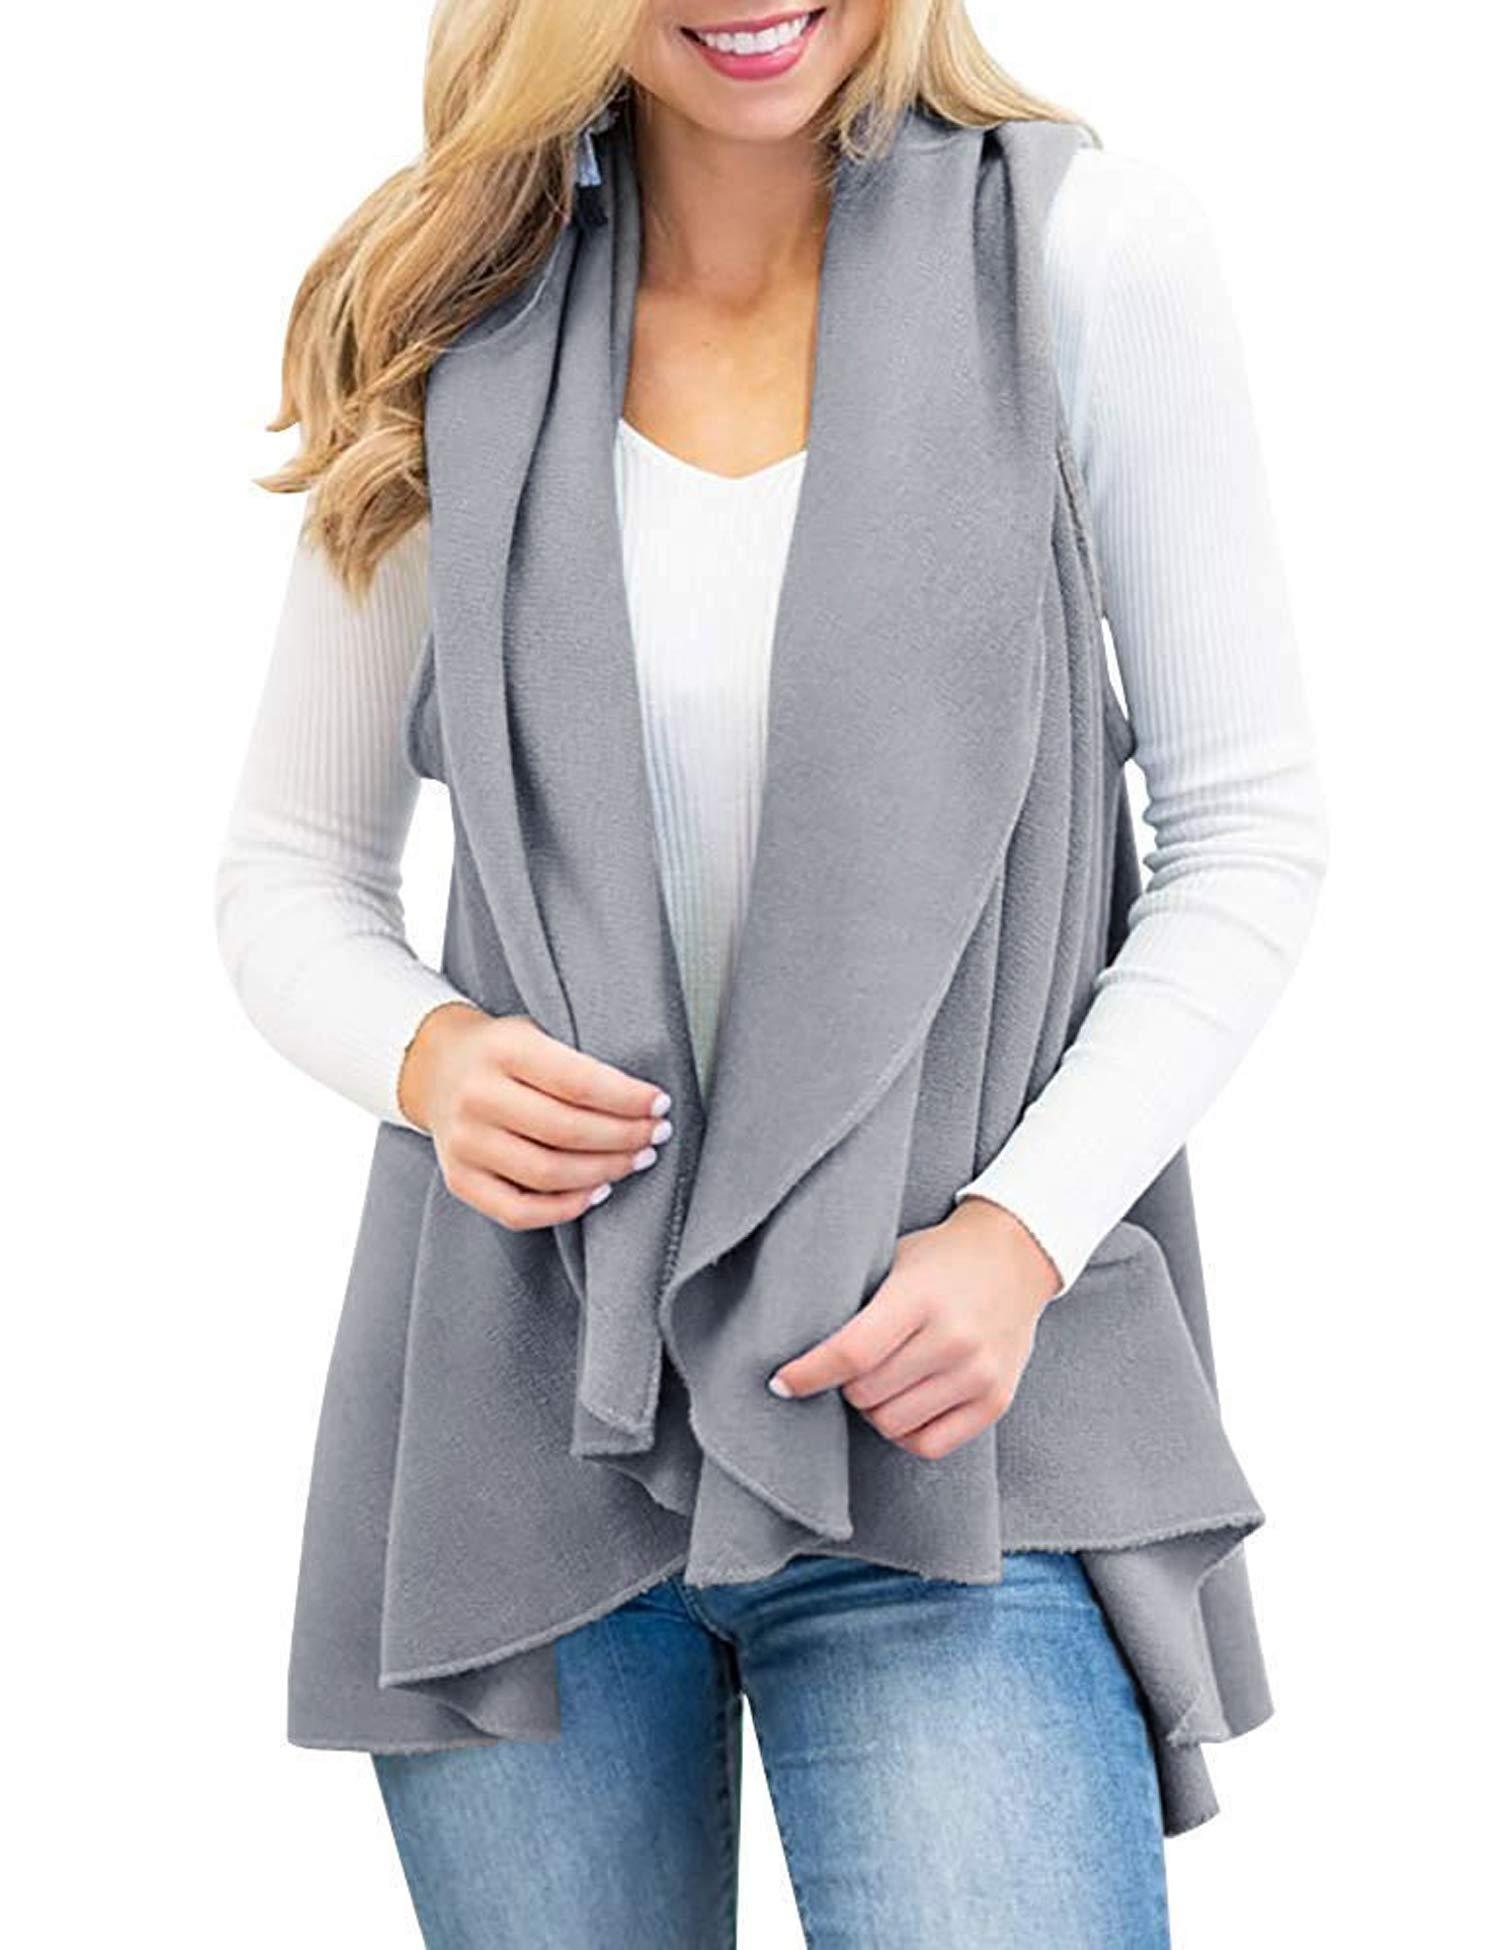 Romanstii Womens Fashion Lapel Open Front Sleeveless Plaid Casual Vest Cardigan Jacket with Pocket